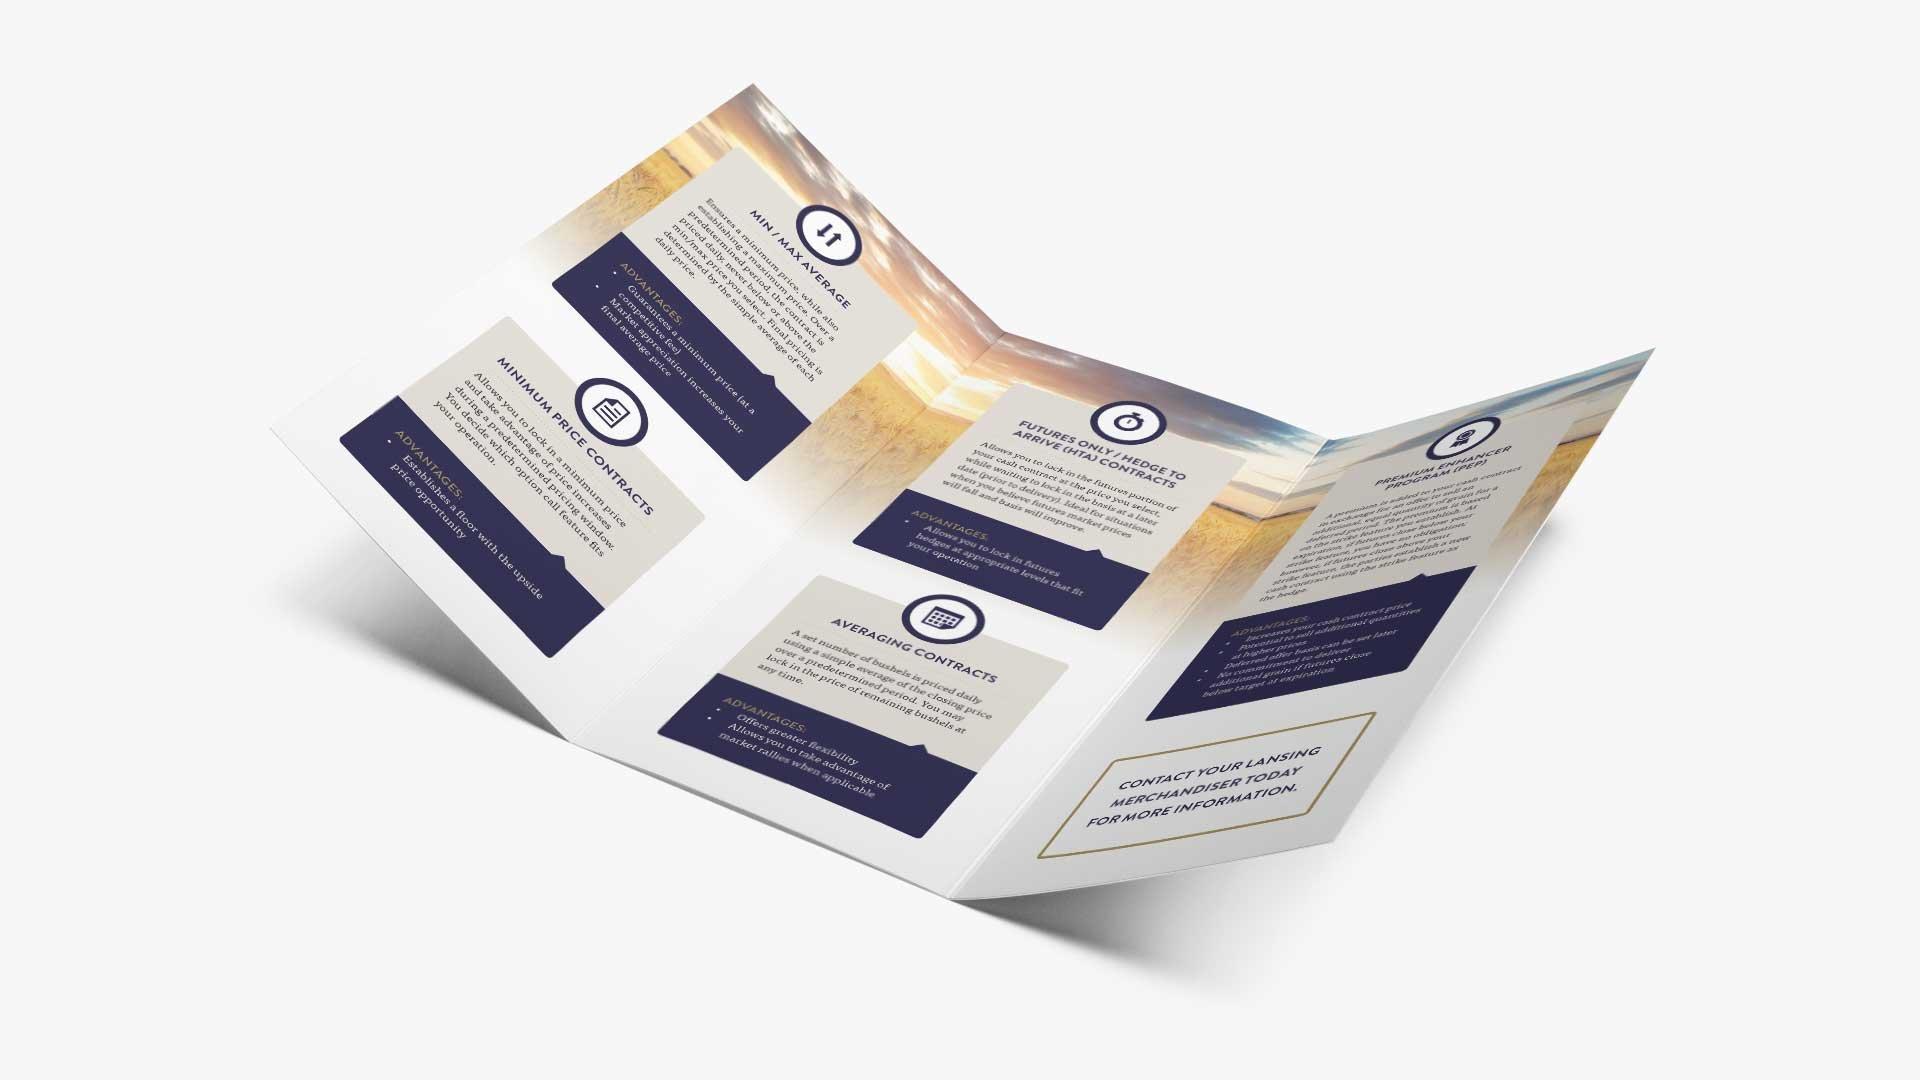 TANK_Agribusiness_Lansing-Trade-Group-Brochure-Open